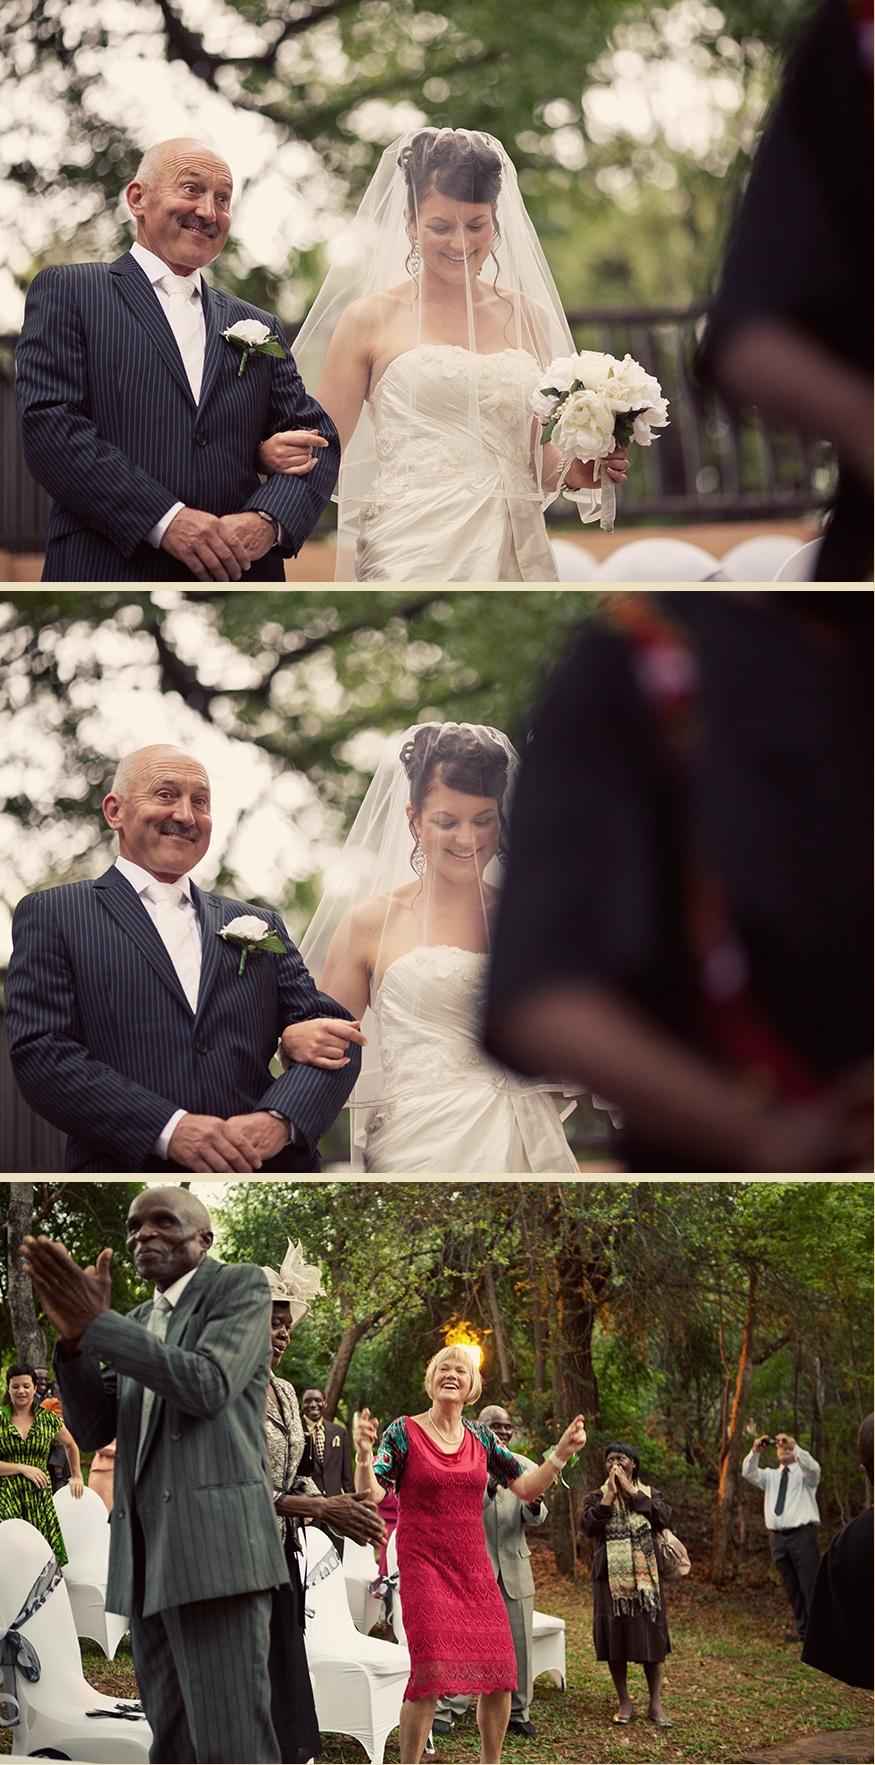 Brisbane Wedding Phoographer Blog-collage-1329182564027